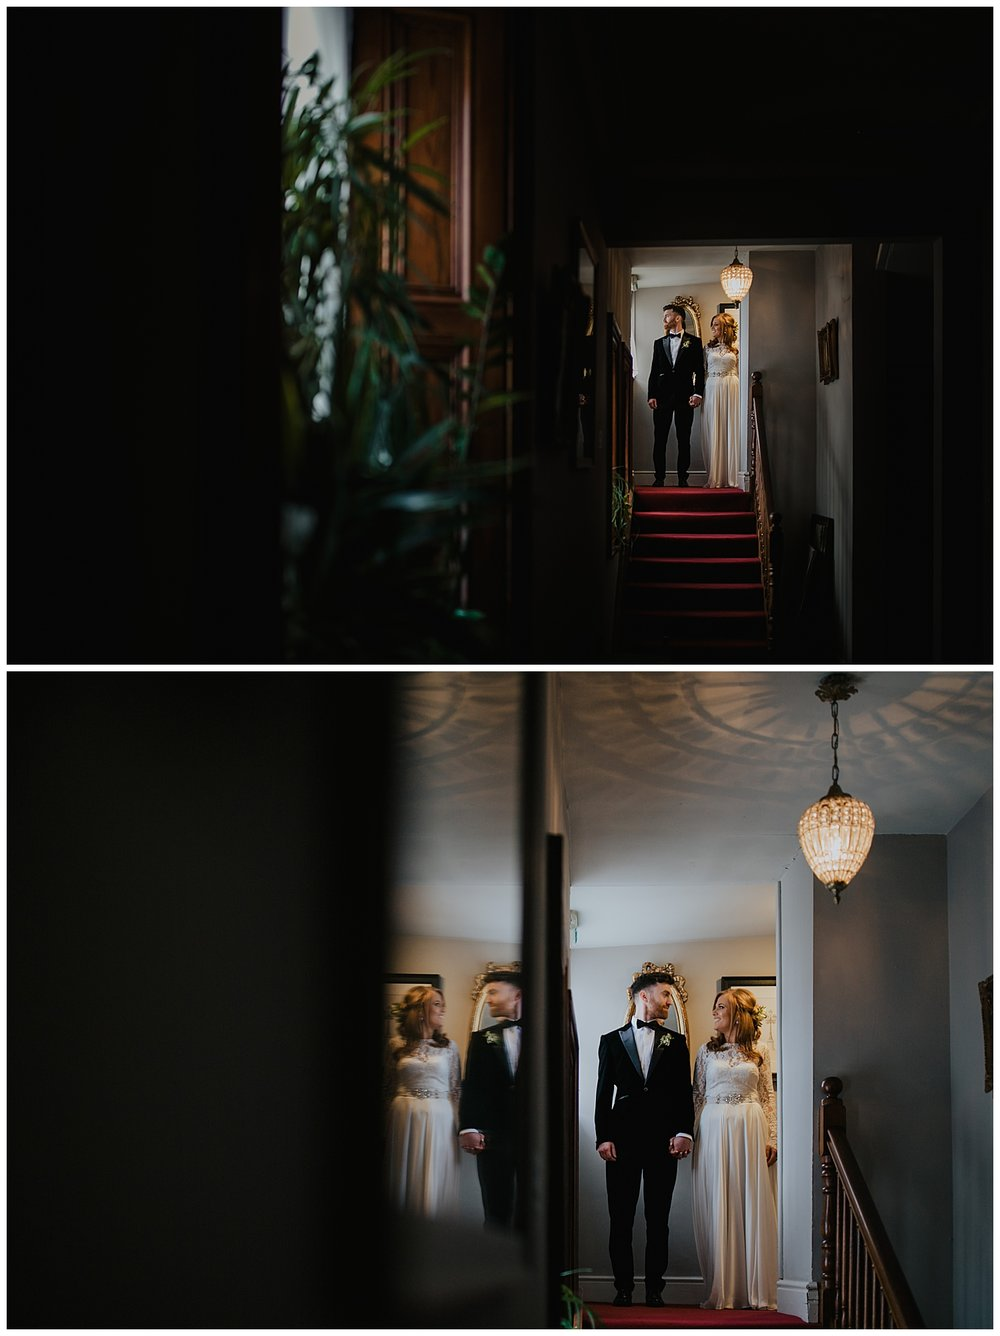 a&c_tinakilly_black_tie_wedding_photographer_livia_figueiredo_207.jpg